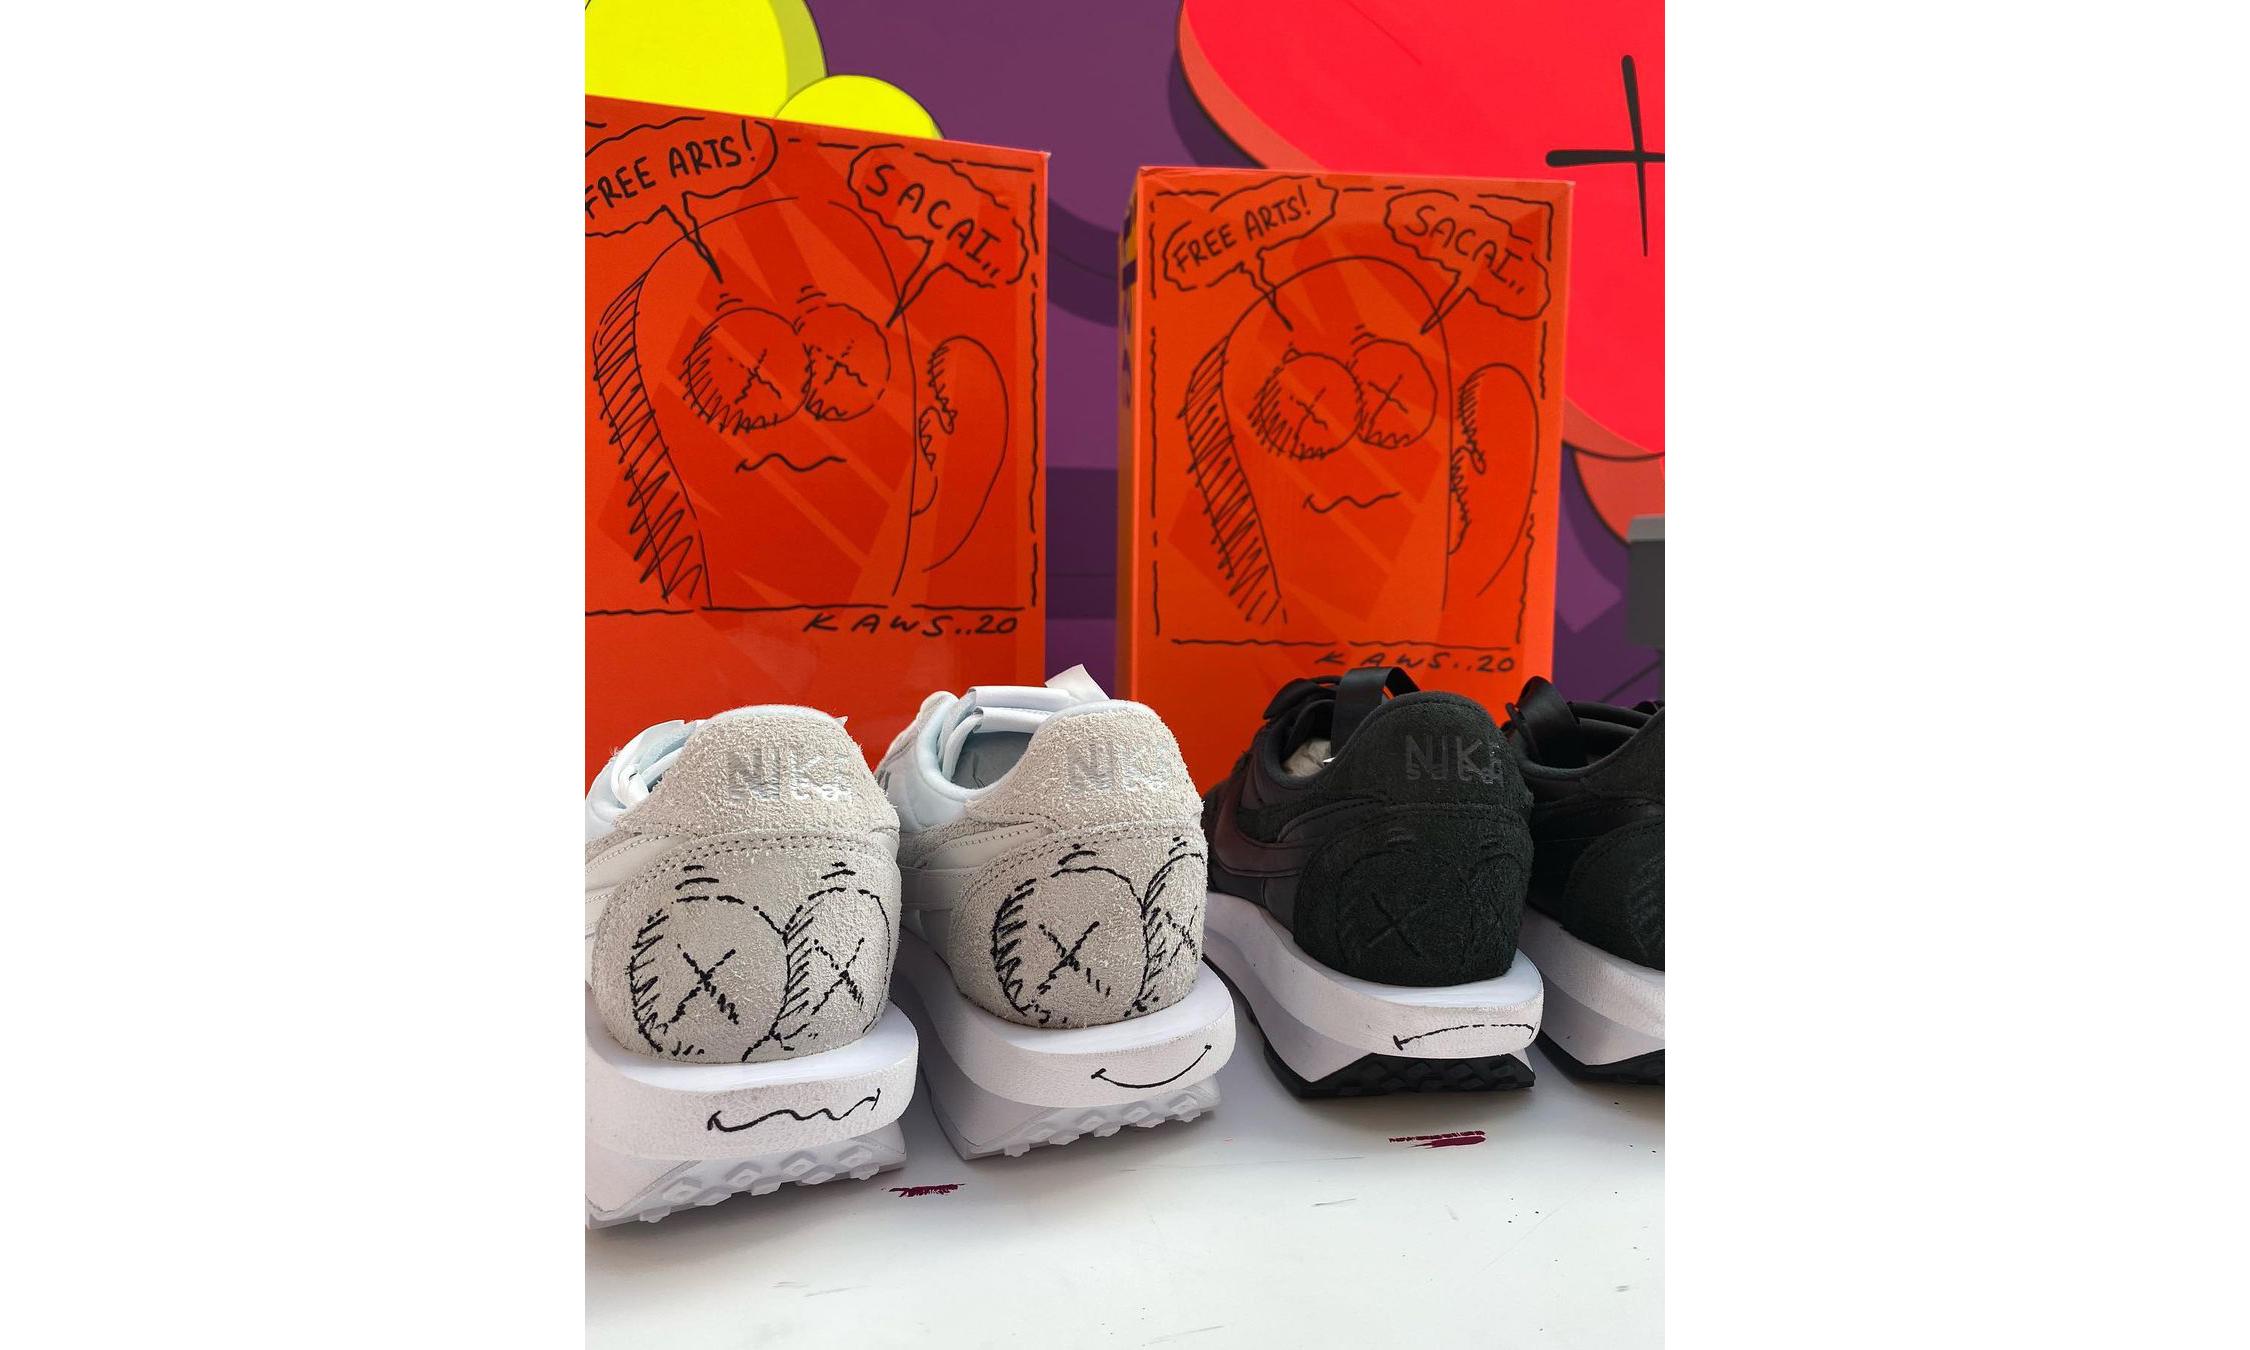 KAWS x sacai x Nike 三方联名来了?